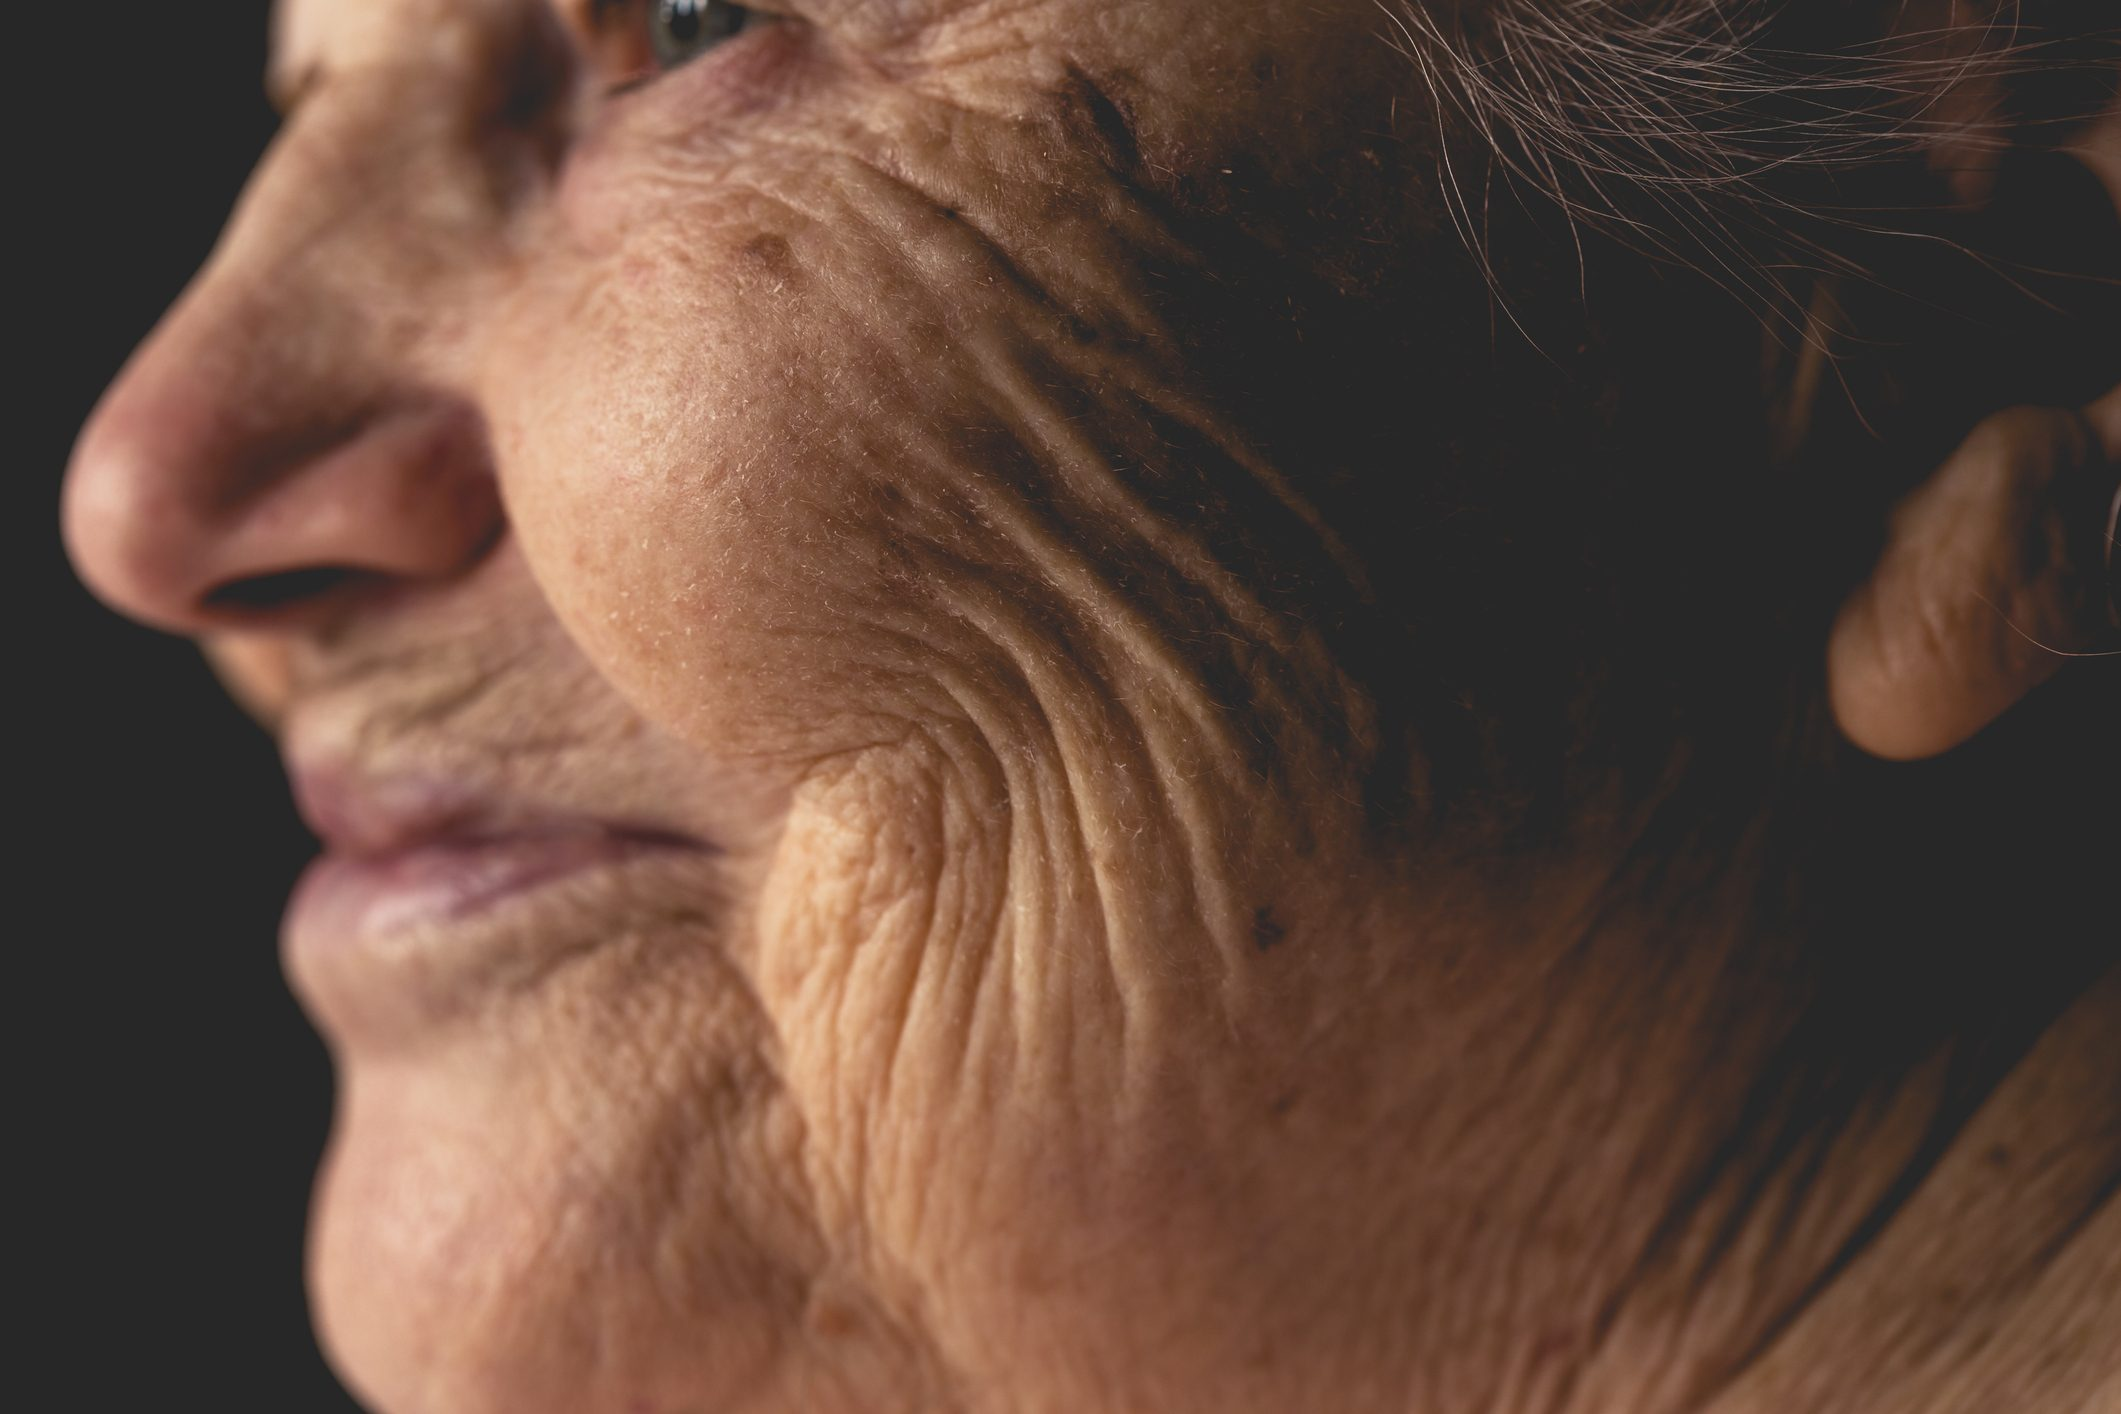 Wrinkled face of elderly woman, smiling details